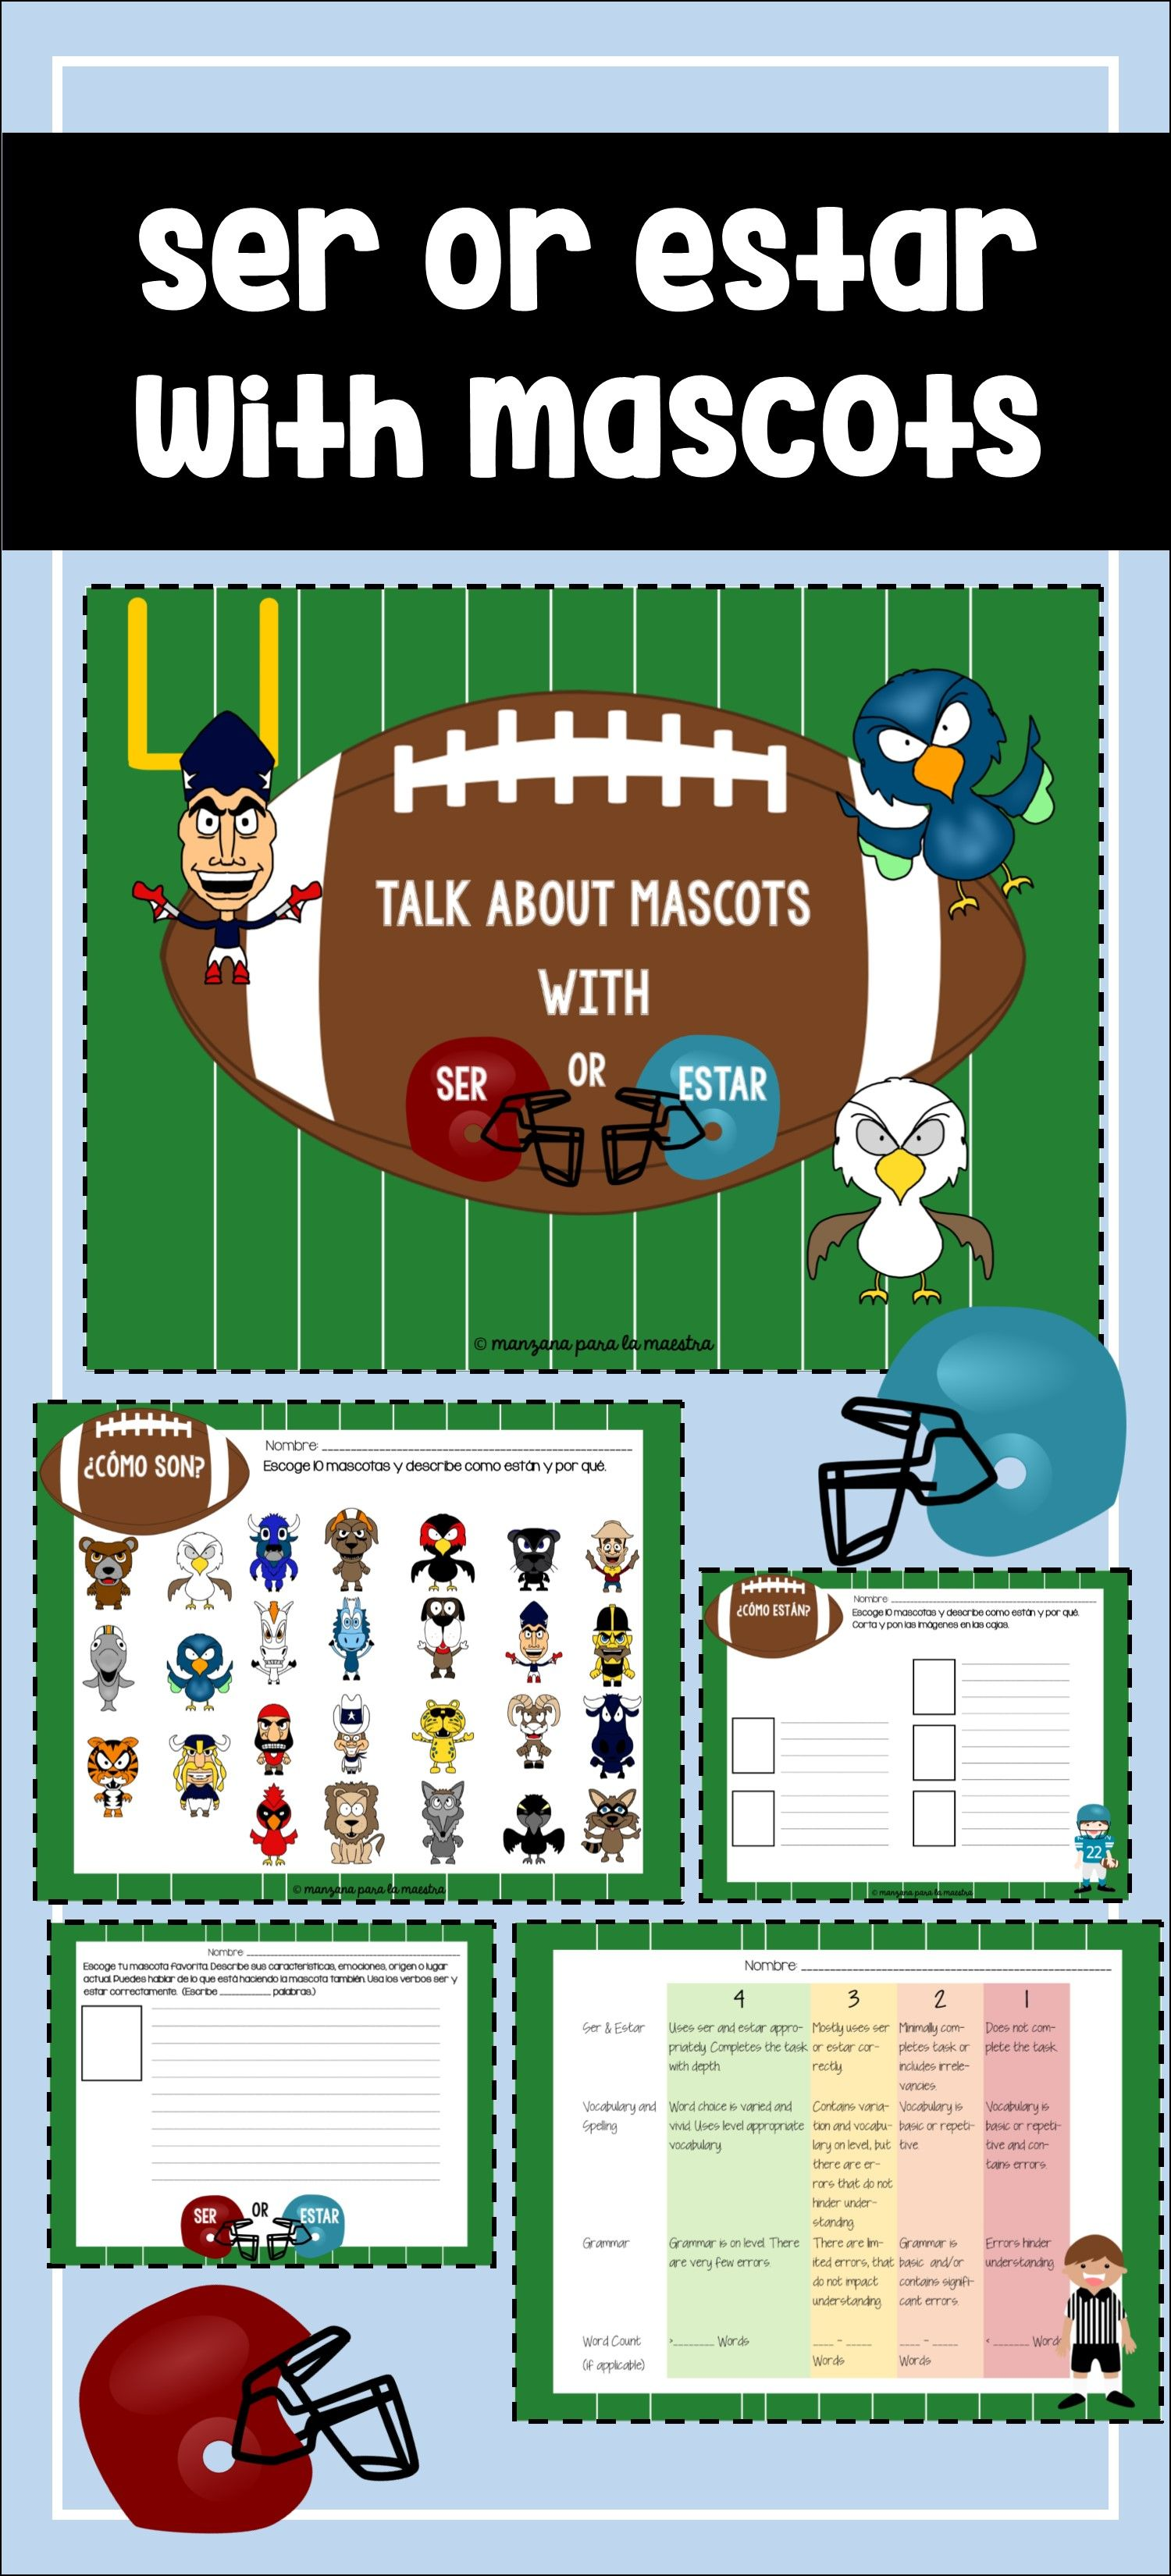 Ser Vs Estar Spanish I Spanish Ii Football Mascot Descriptions Great To Engage Your Sports Fan Spanish Teaching Resources Spanish Lessons High School Spanish [ 3300 x 1500 Pixel ]